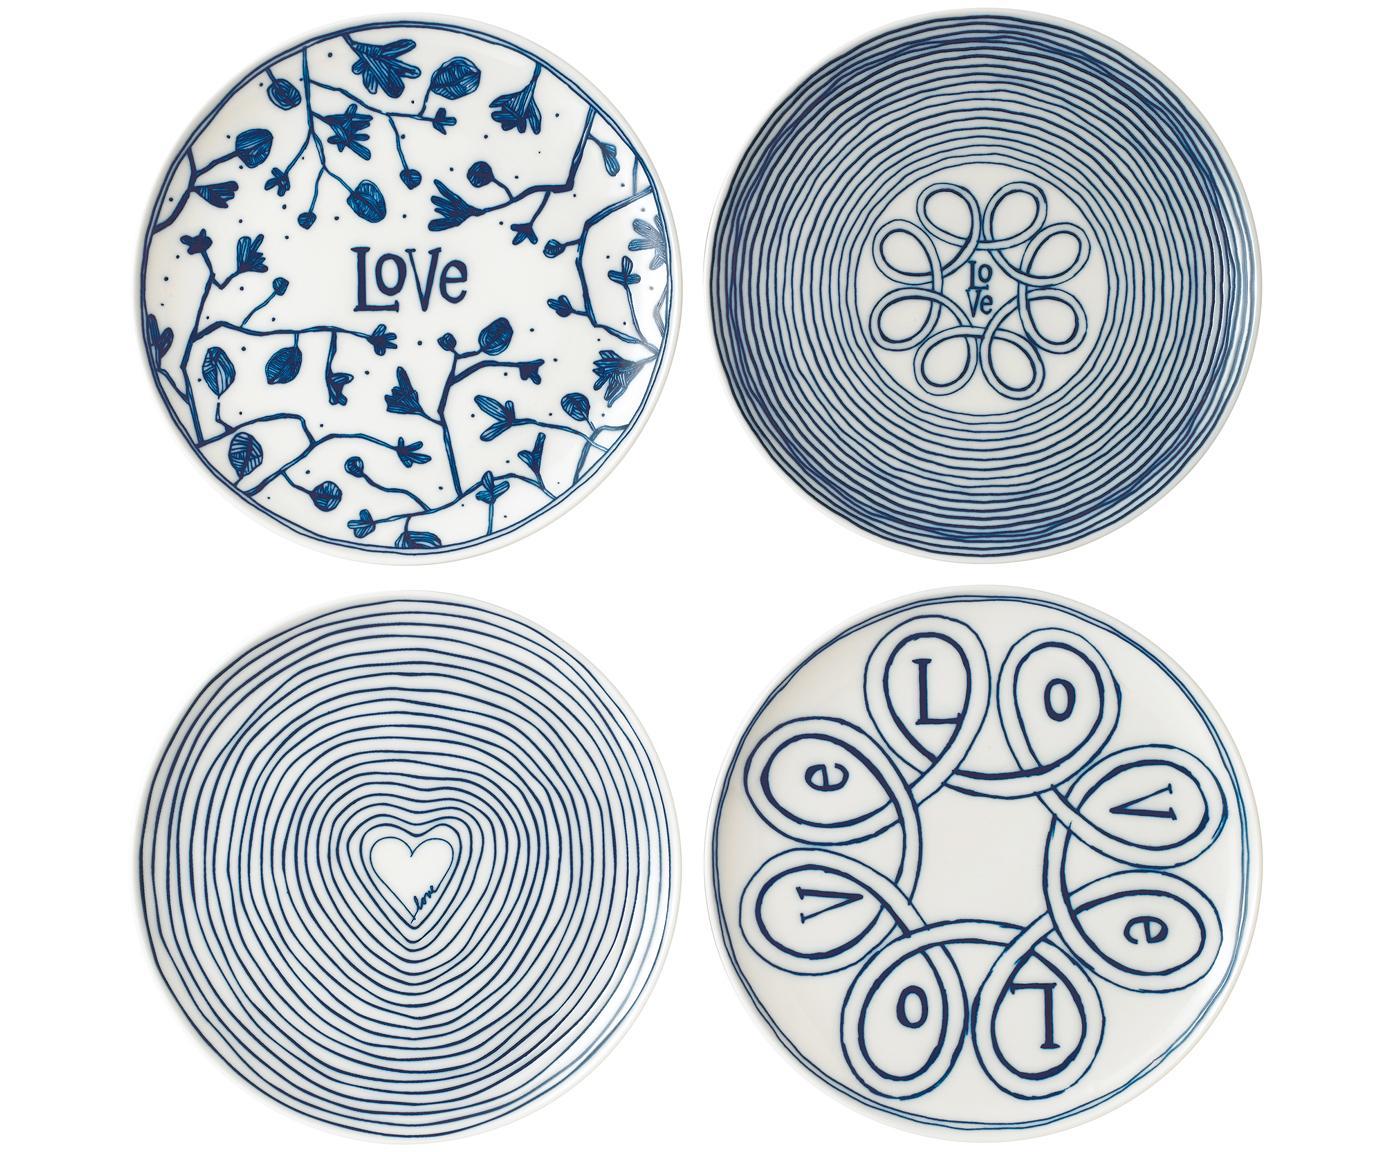 Set 4 piatti da colazione bianco/blu Love, Porcellana, Avorio, blu cobalto, Ø 21 cm